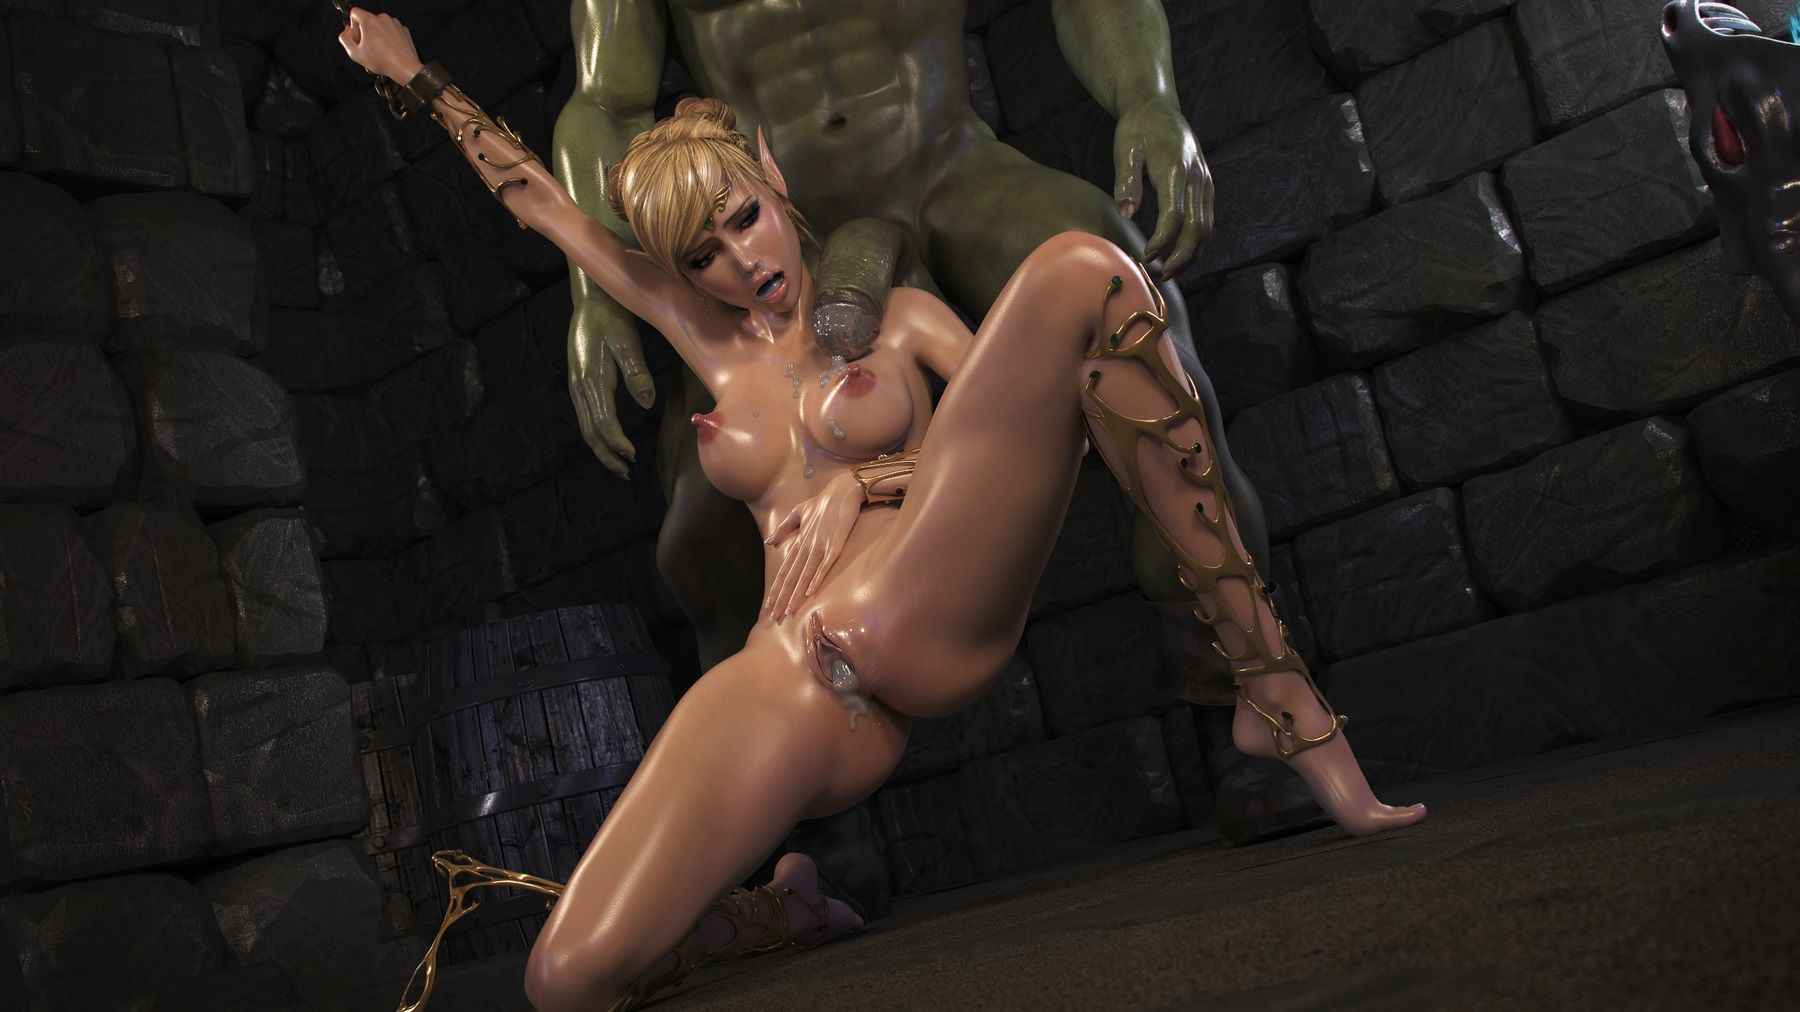 Dungeon sex toy porn gif